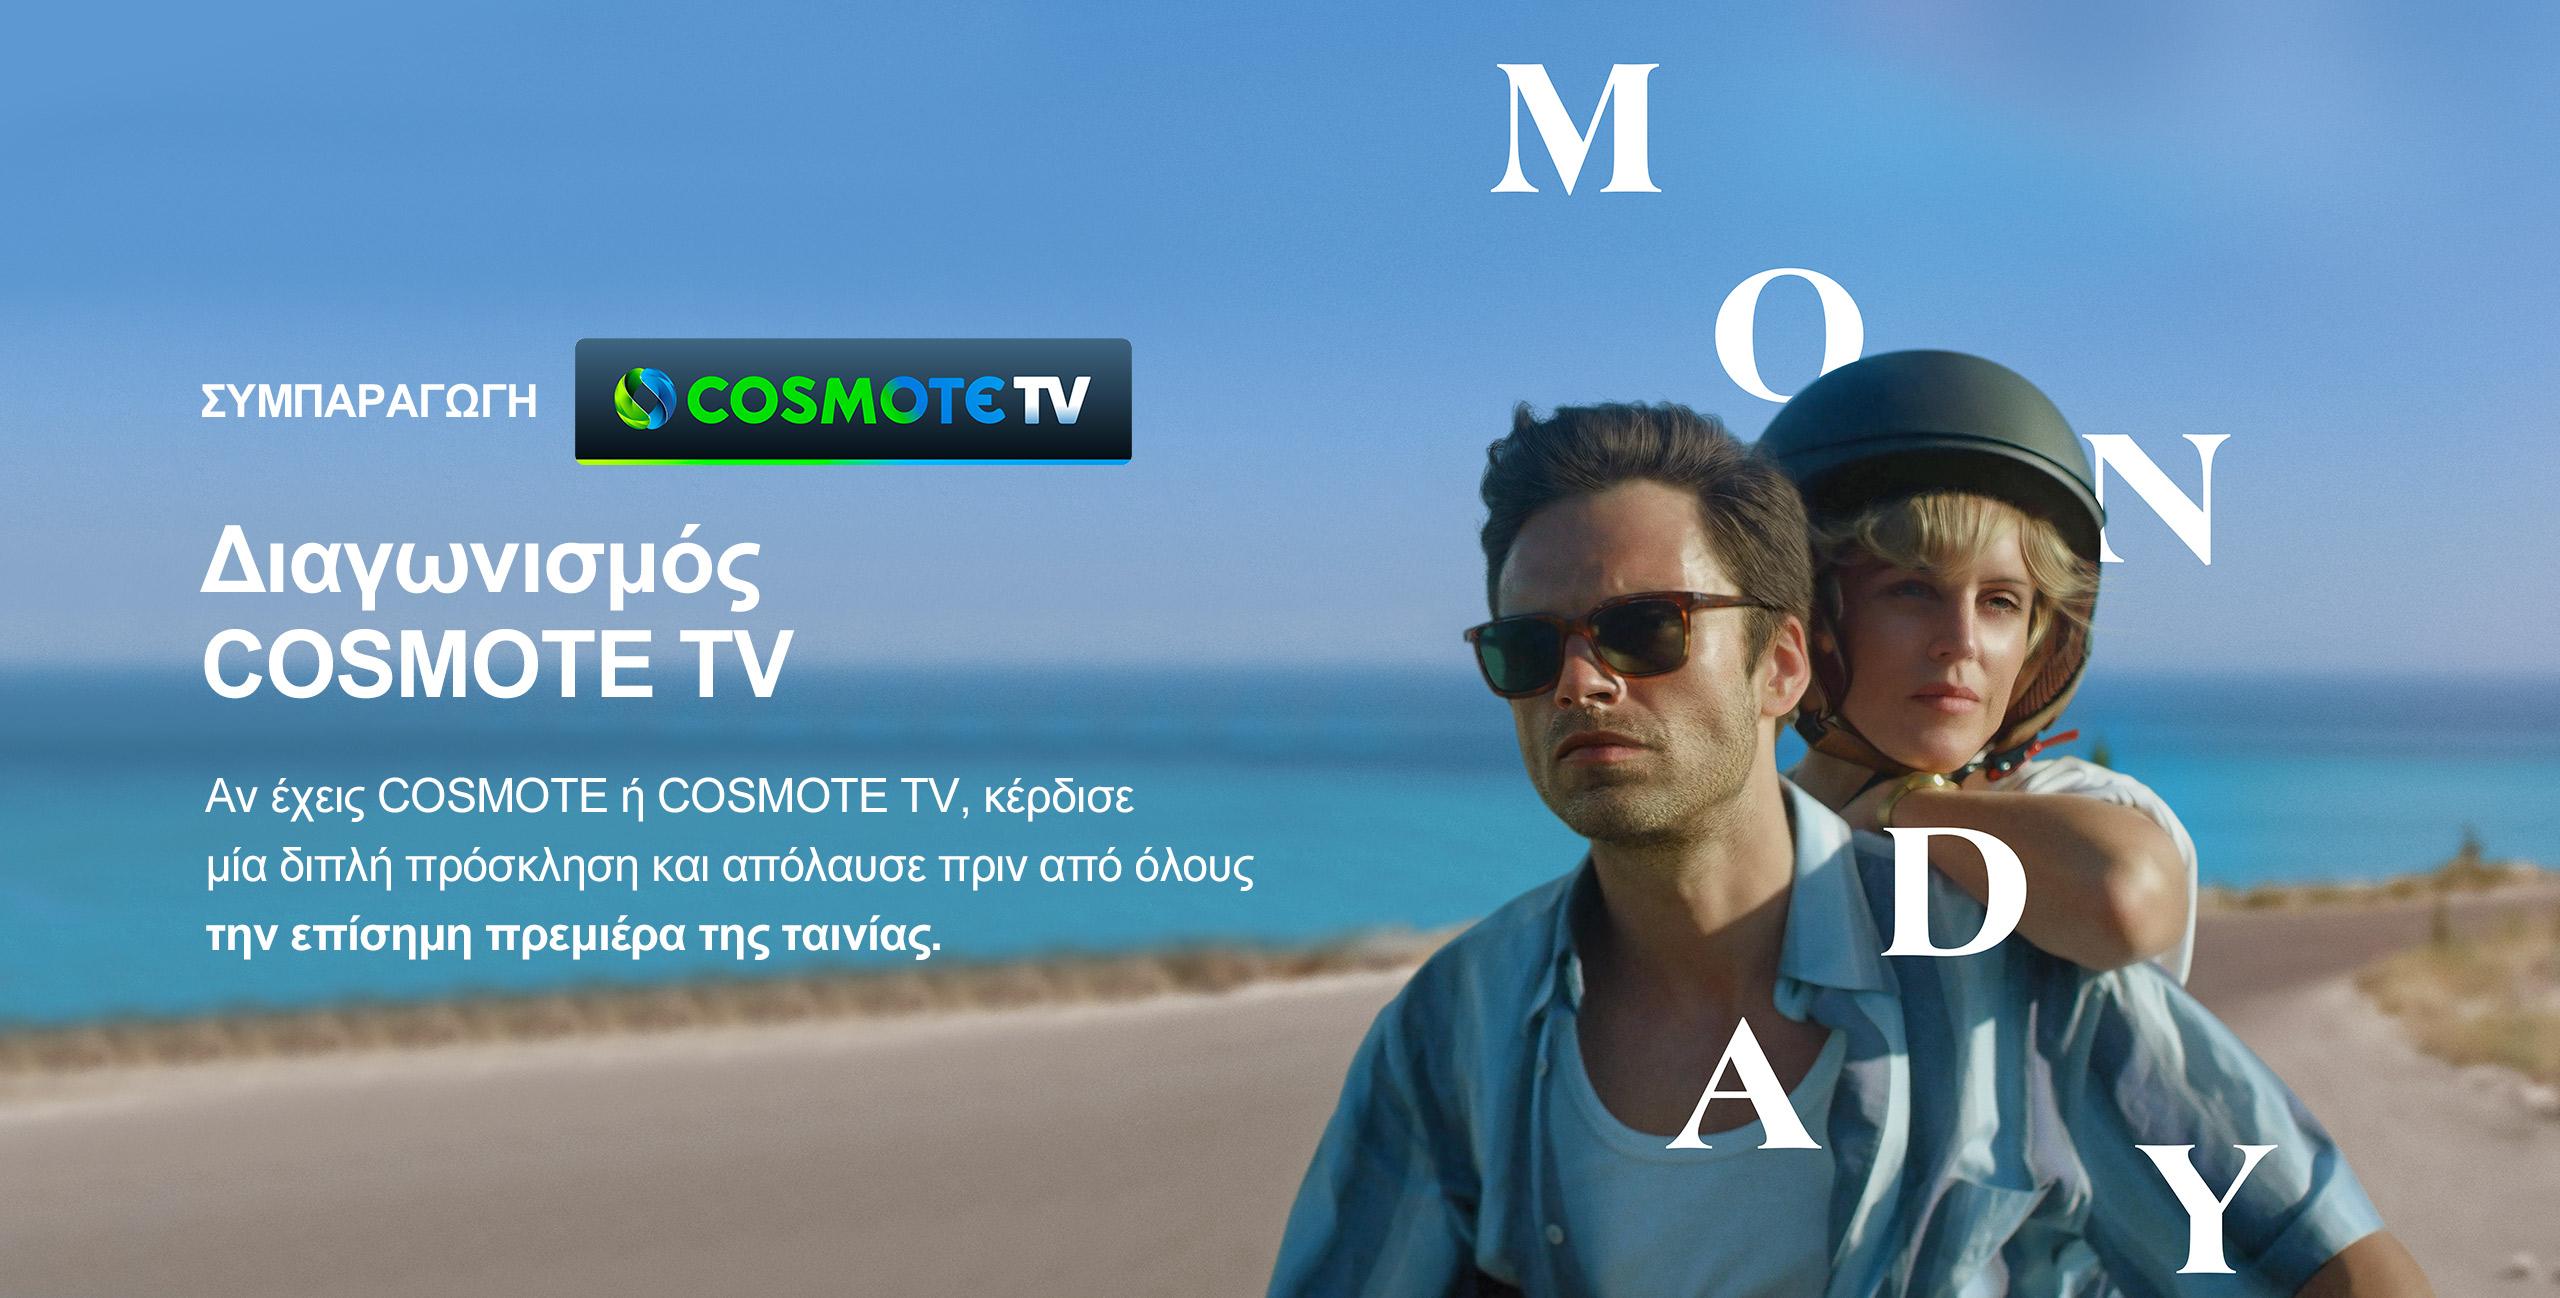 COSMOTE TV Διαγωνισμός